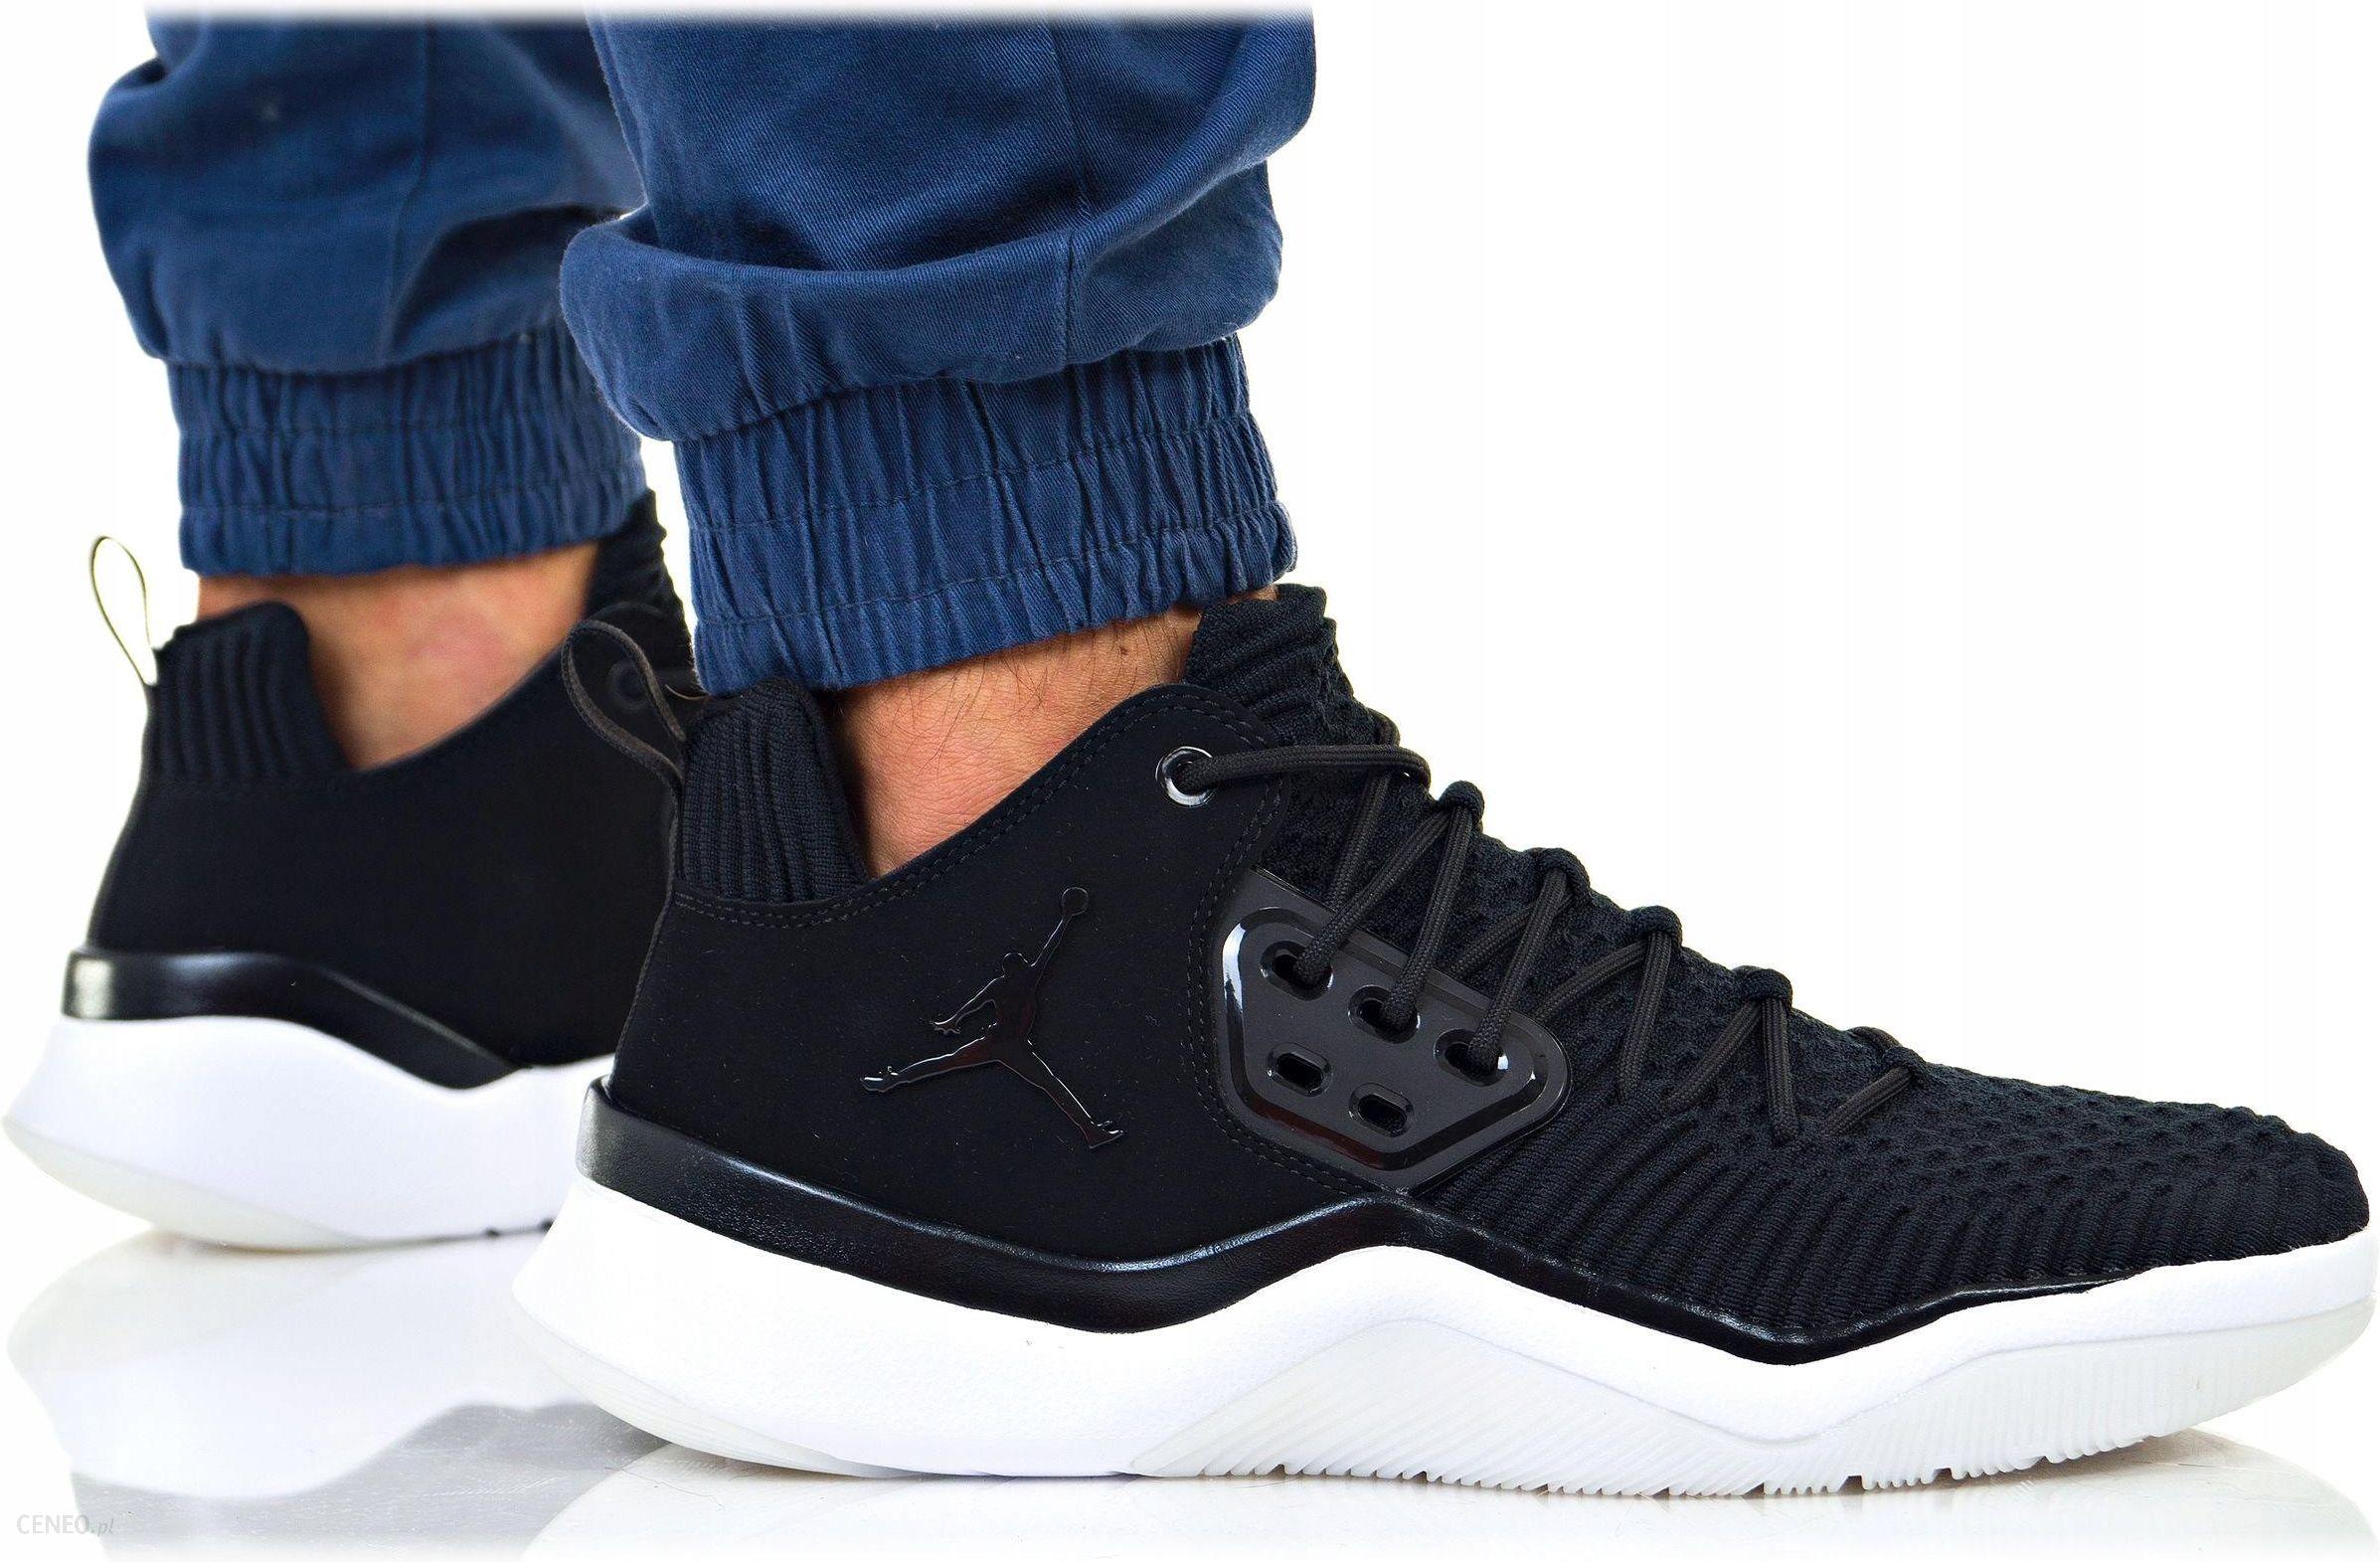 Jordan dna lx (ao2649 001) (Nike)